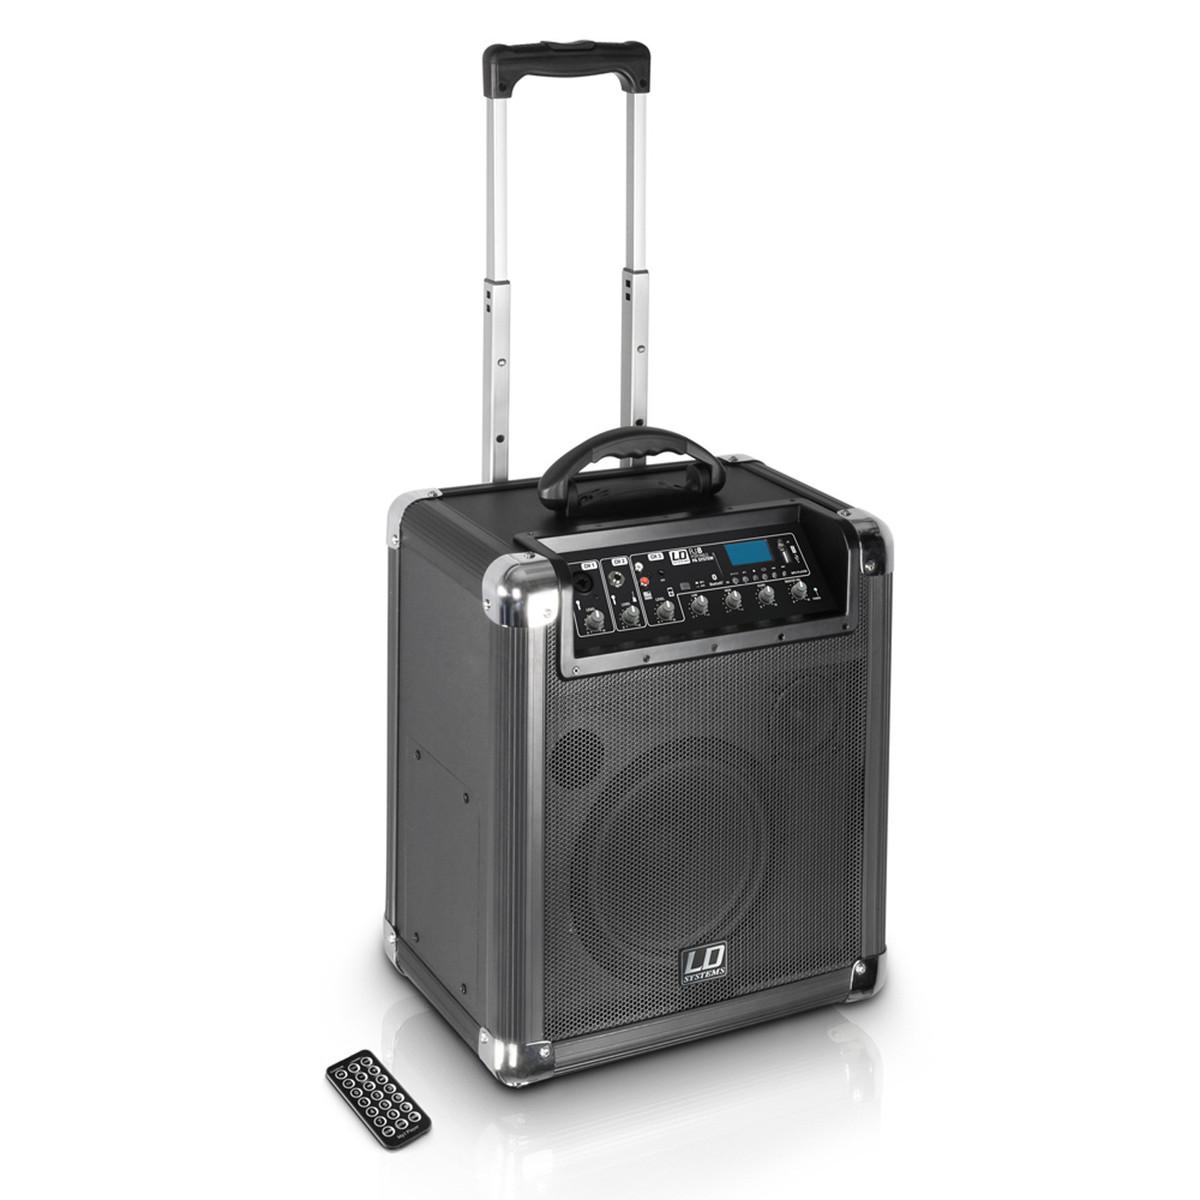 RYDDESALG | LD Systems Roadjack 8 - Battery Powered Bluetooth Loudspeaker with Mixer | pris pr stk